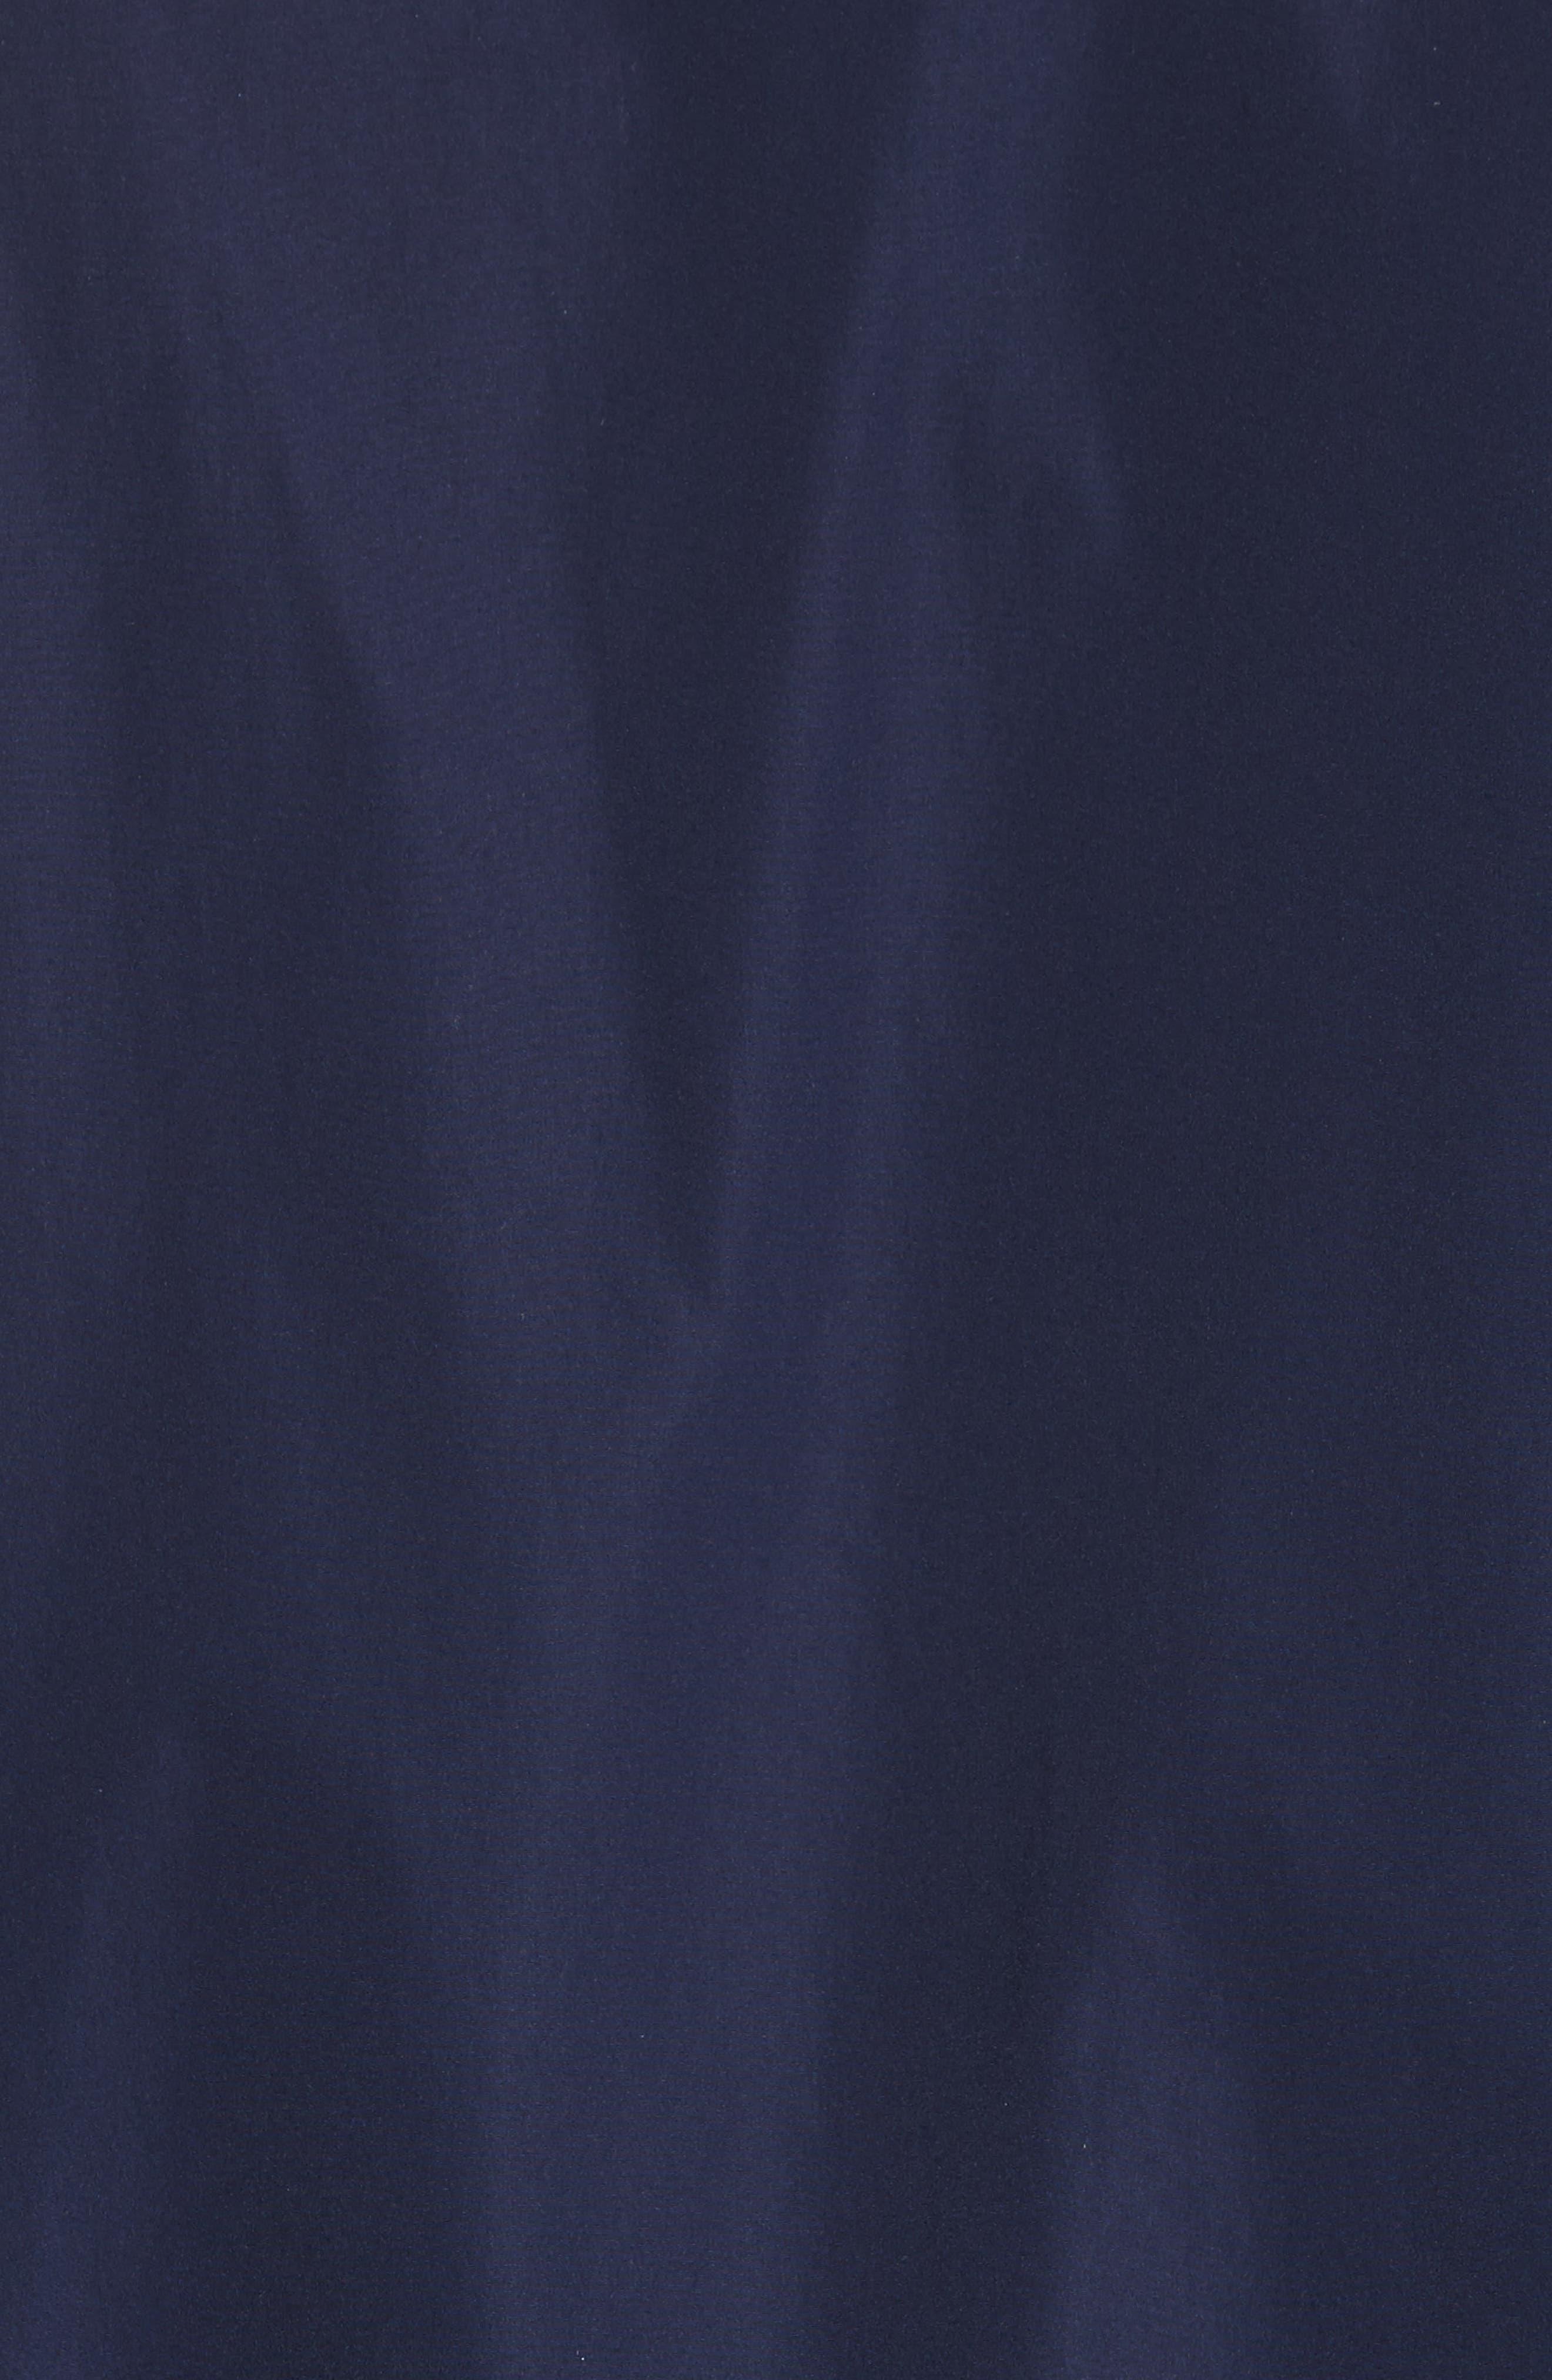 Artouste Bomber Jacket,                             Alternate thumbnail 5, color,                             Navy